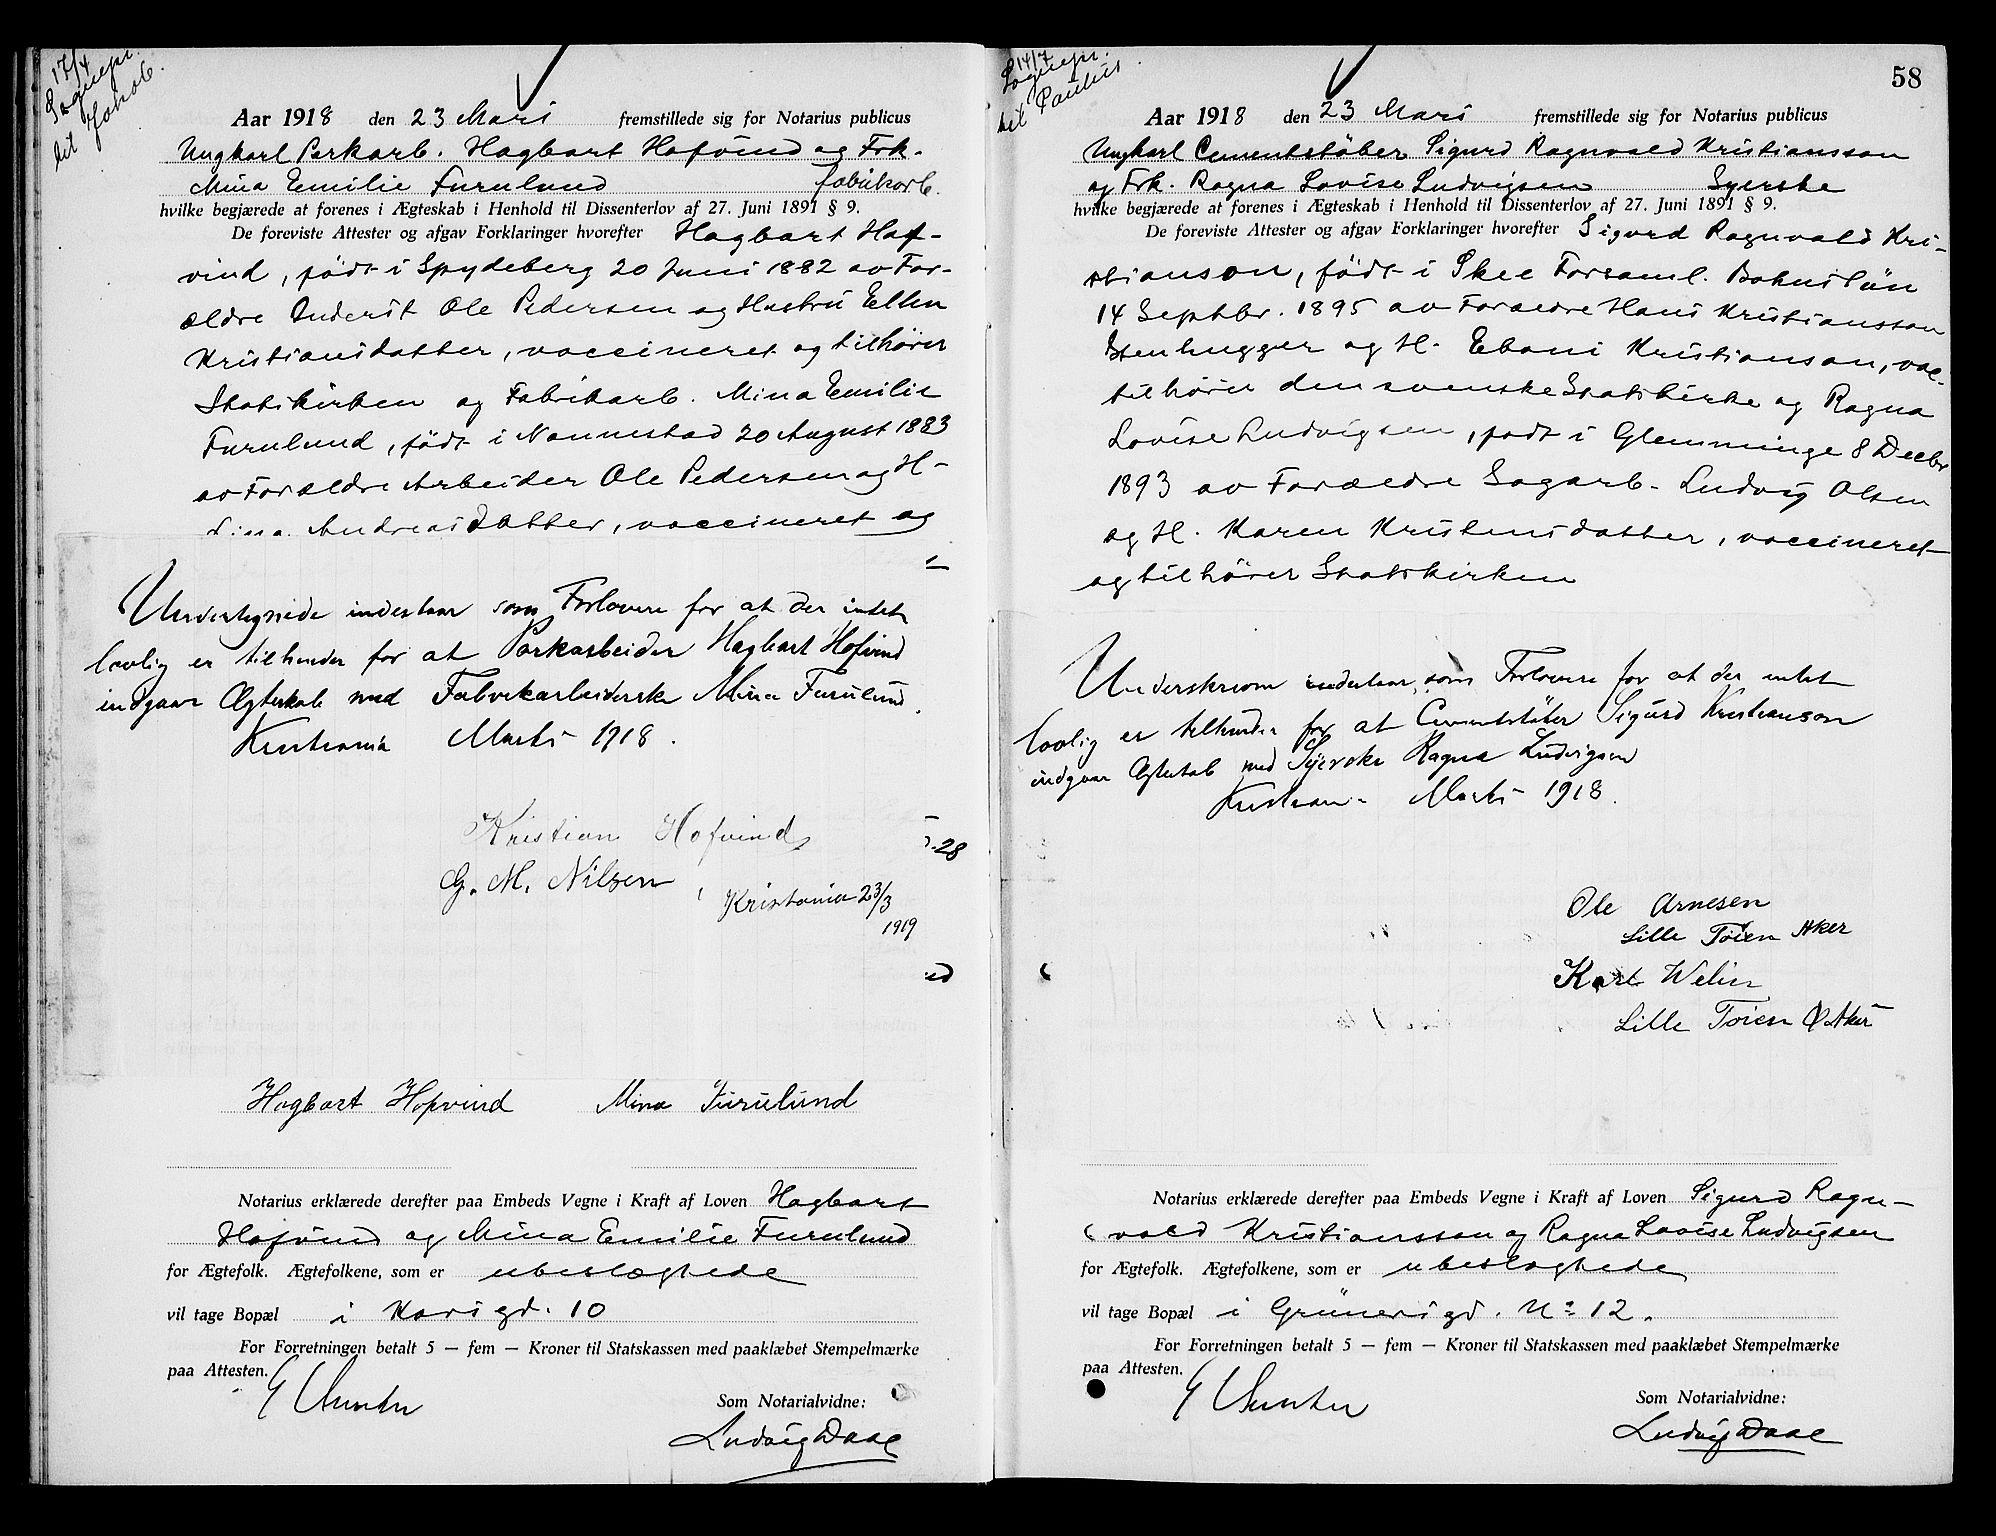 SAO, Oslo byfogd avd. I, L/Lb/Lbb/L0012: Notarialprotokoll, rekke II: Vigsler, 1918-1919, s. 57b-58a